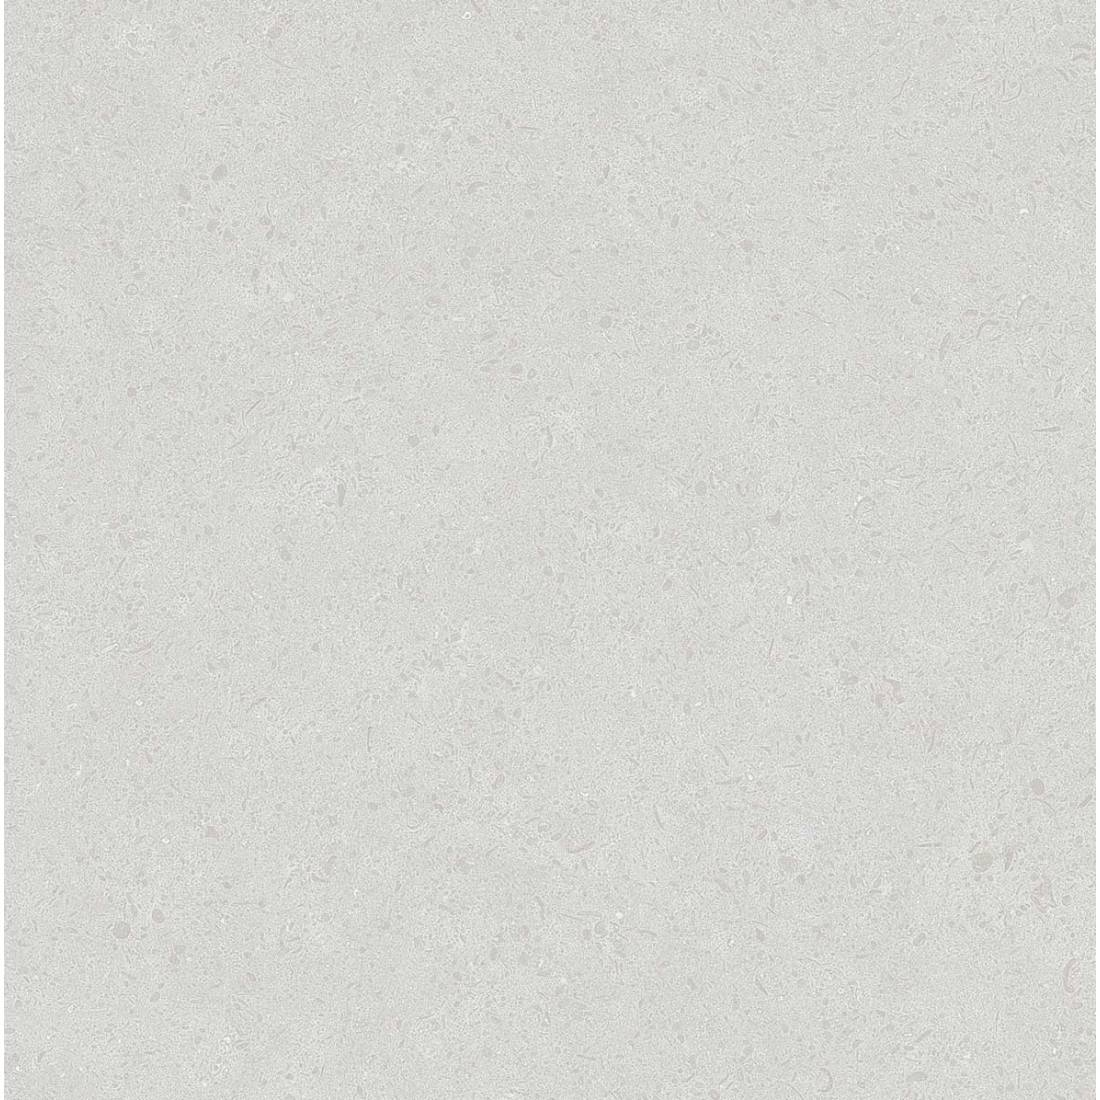 Petra 31.6x31.6 Blanco 1